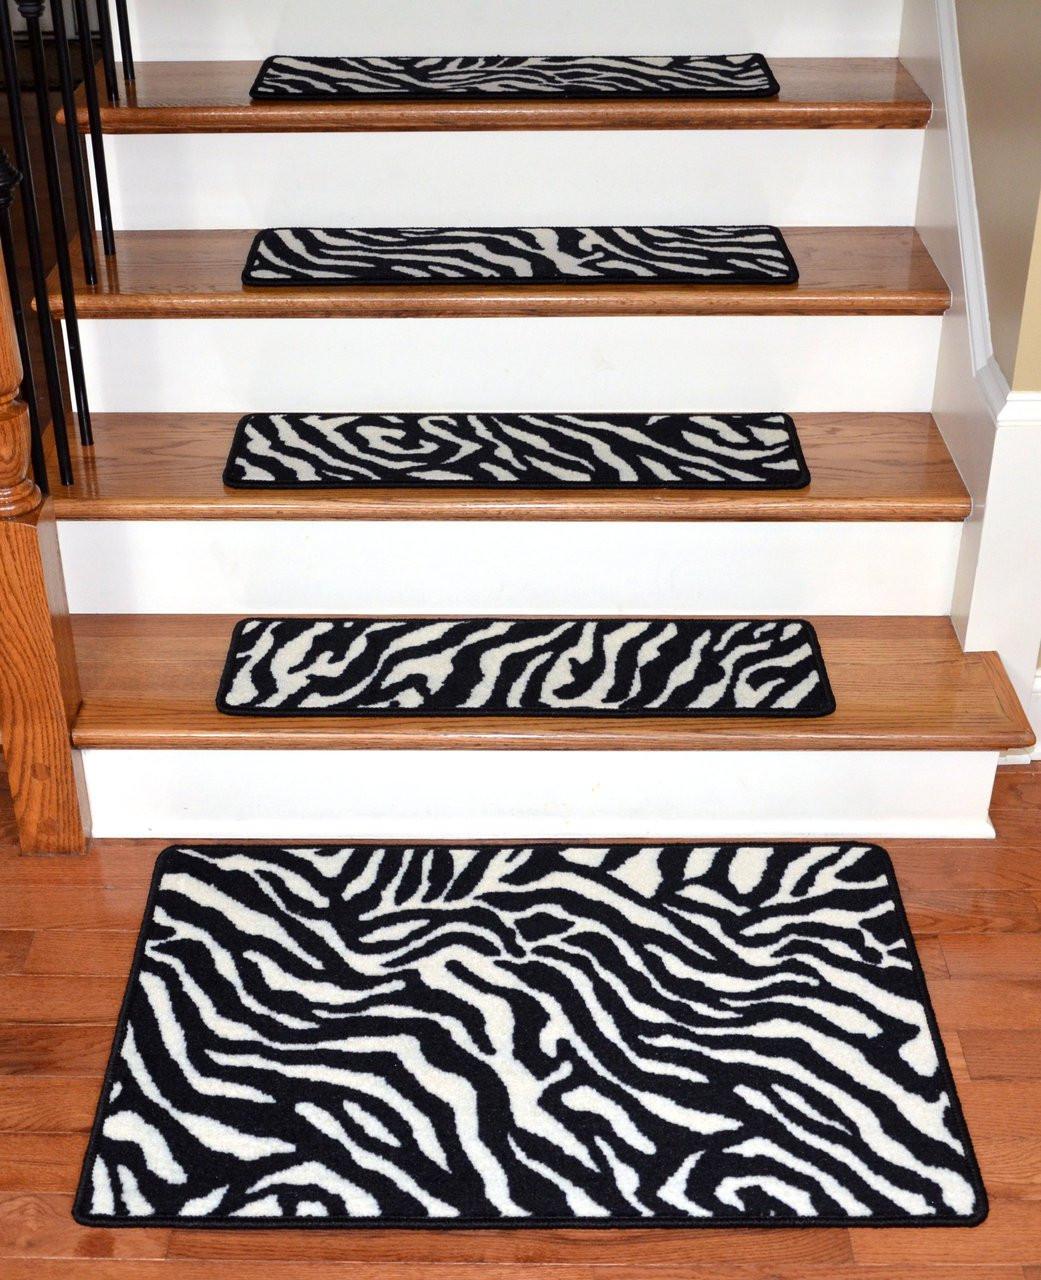 30 Quot X 9 Quot Zebra Stair Treads 13 Amp 2 X 3 Landing Mat